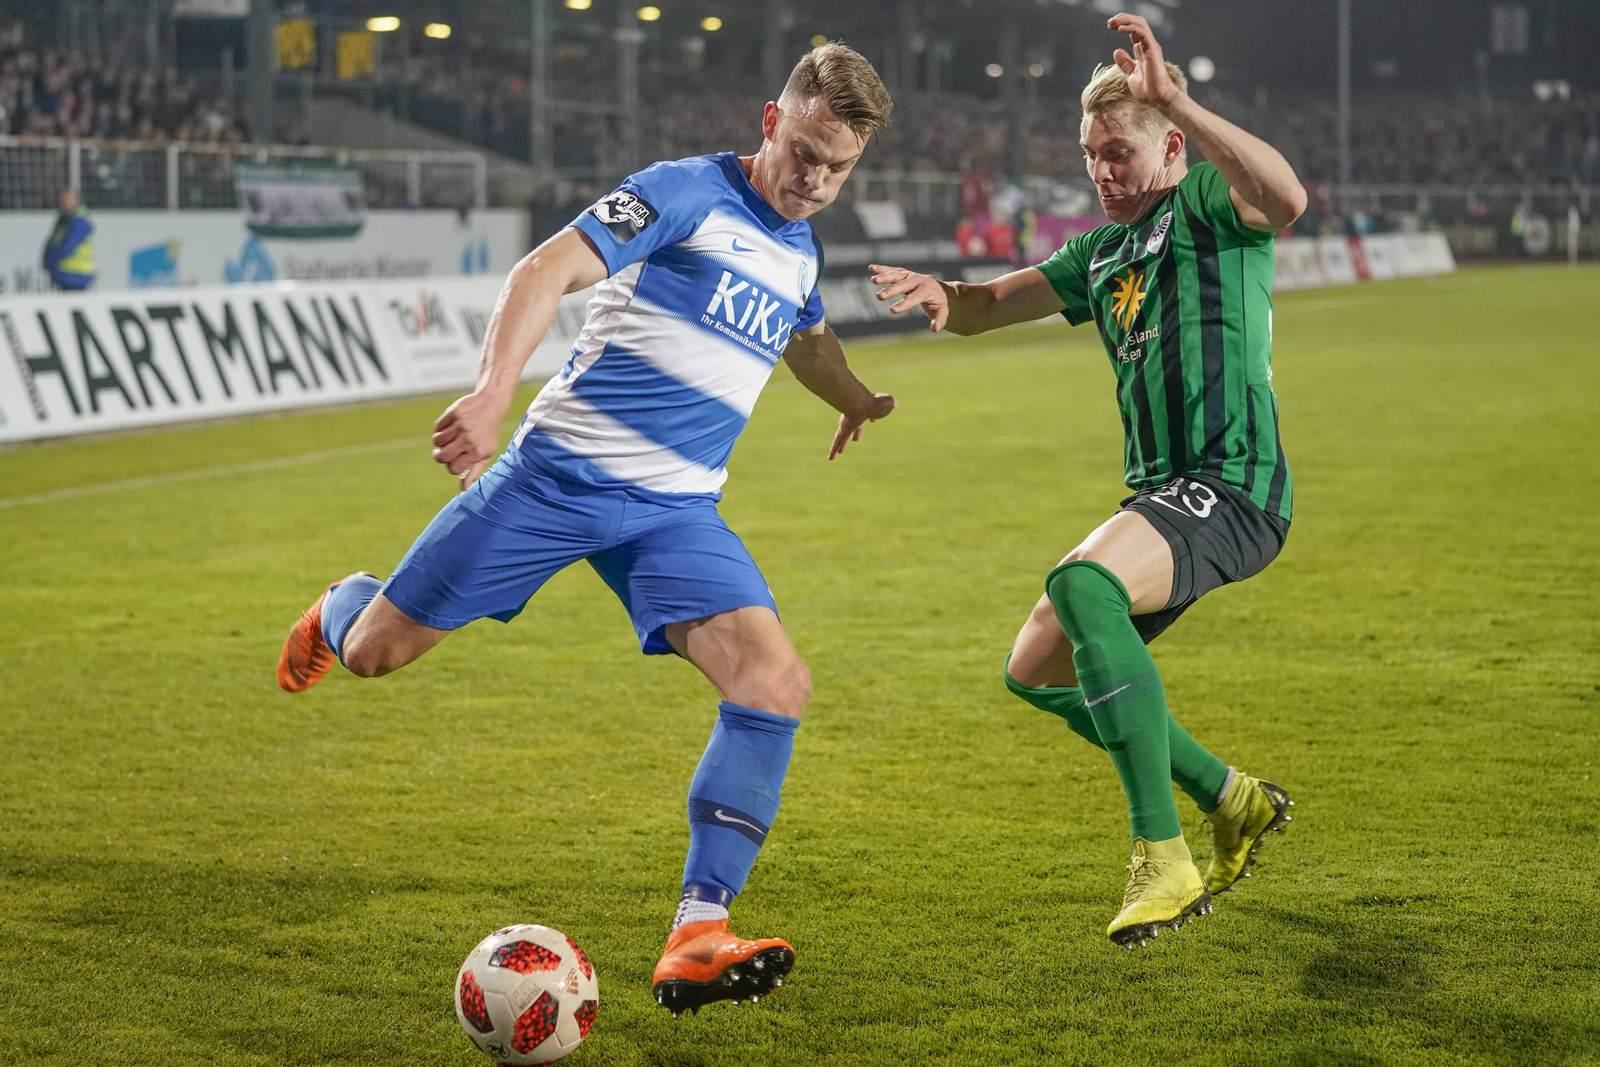 rene guder, niklas heidemann, sv meppen, preußen münster, 3. liga